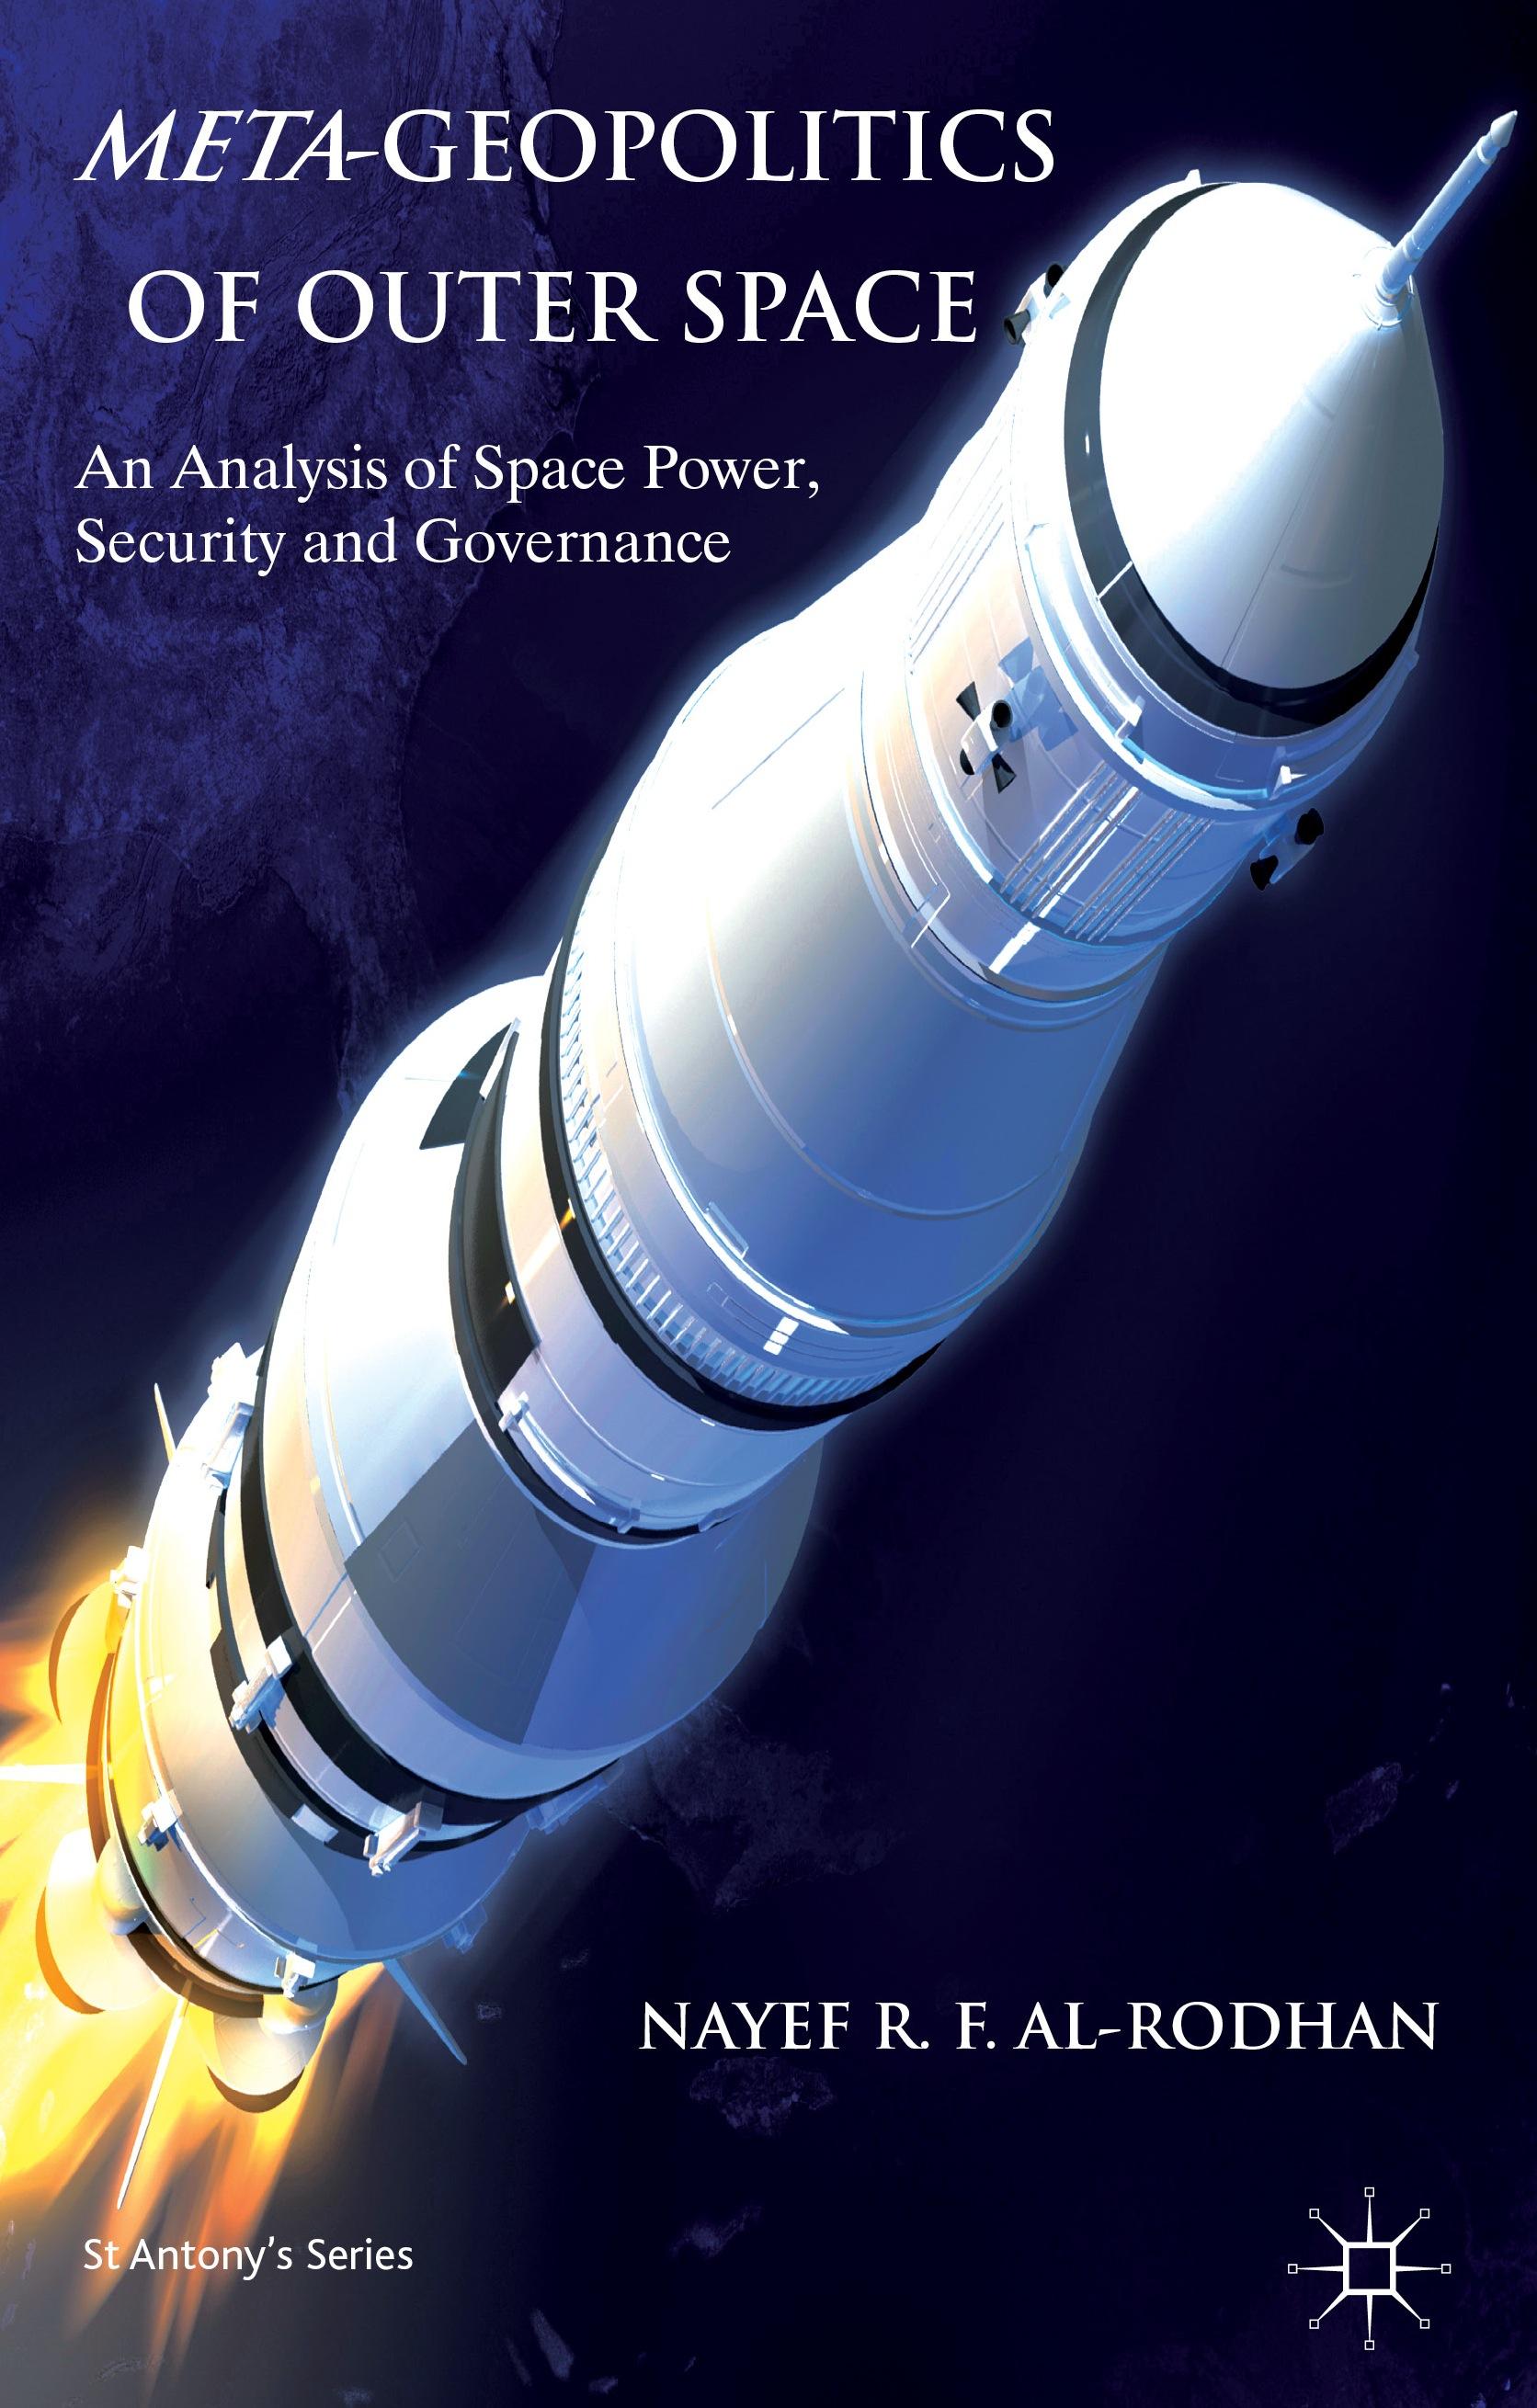 Meta-Geopolitics of Outer Space.jpg